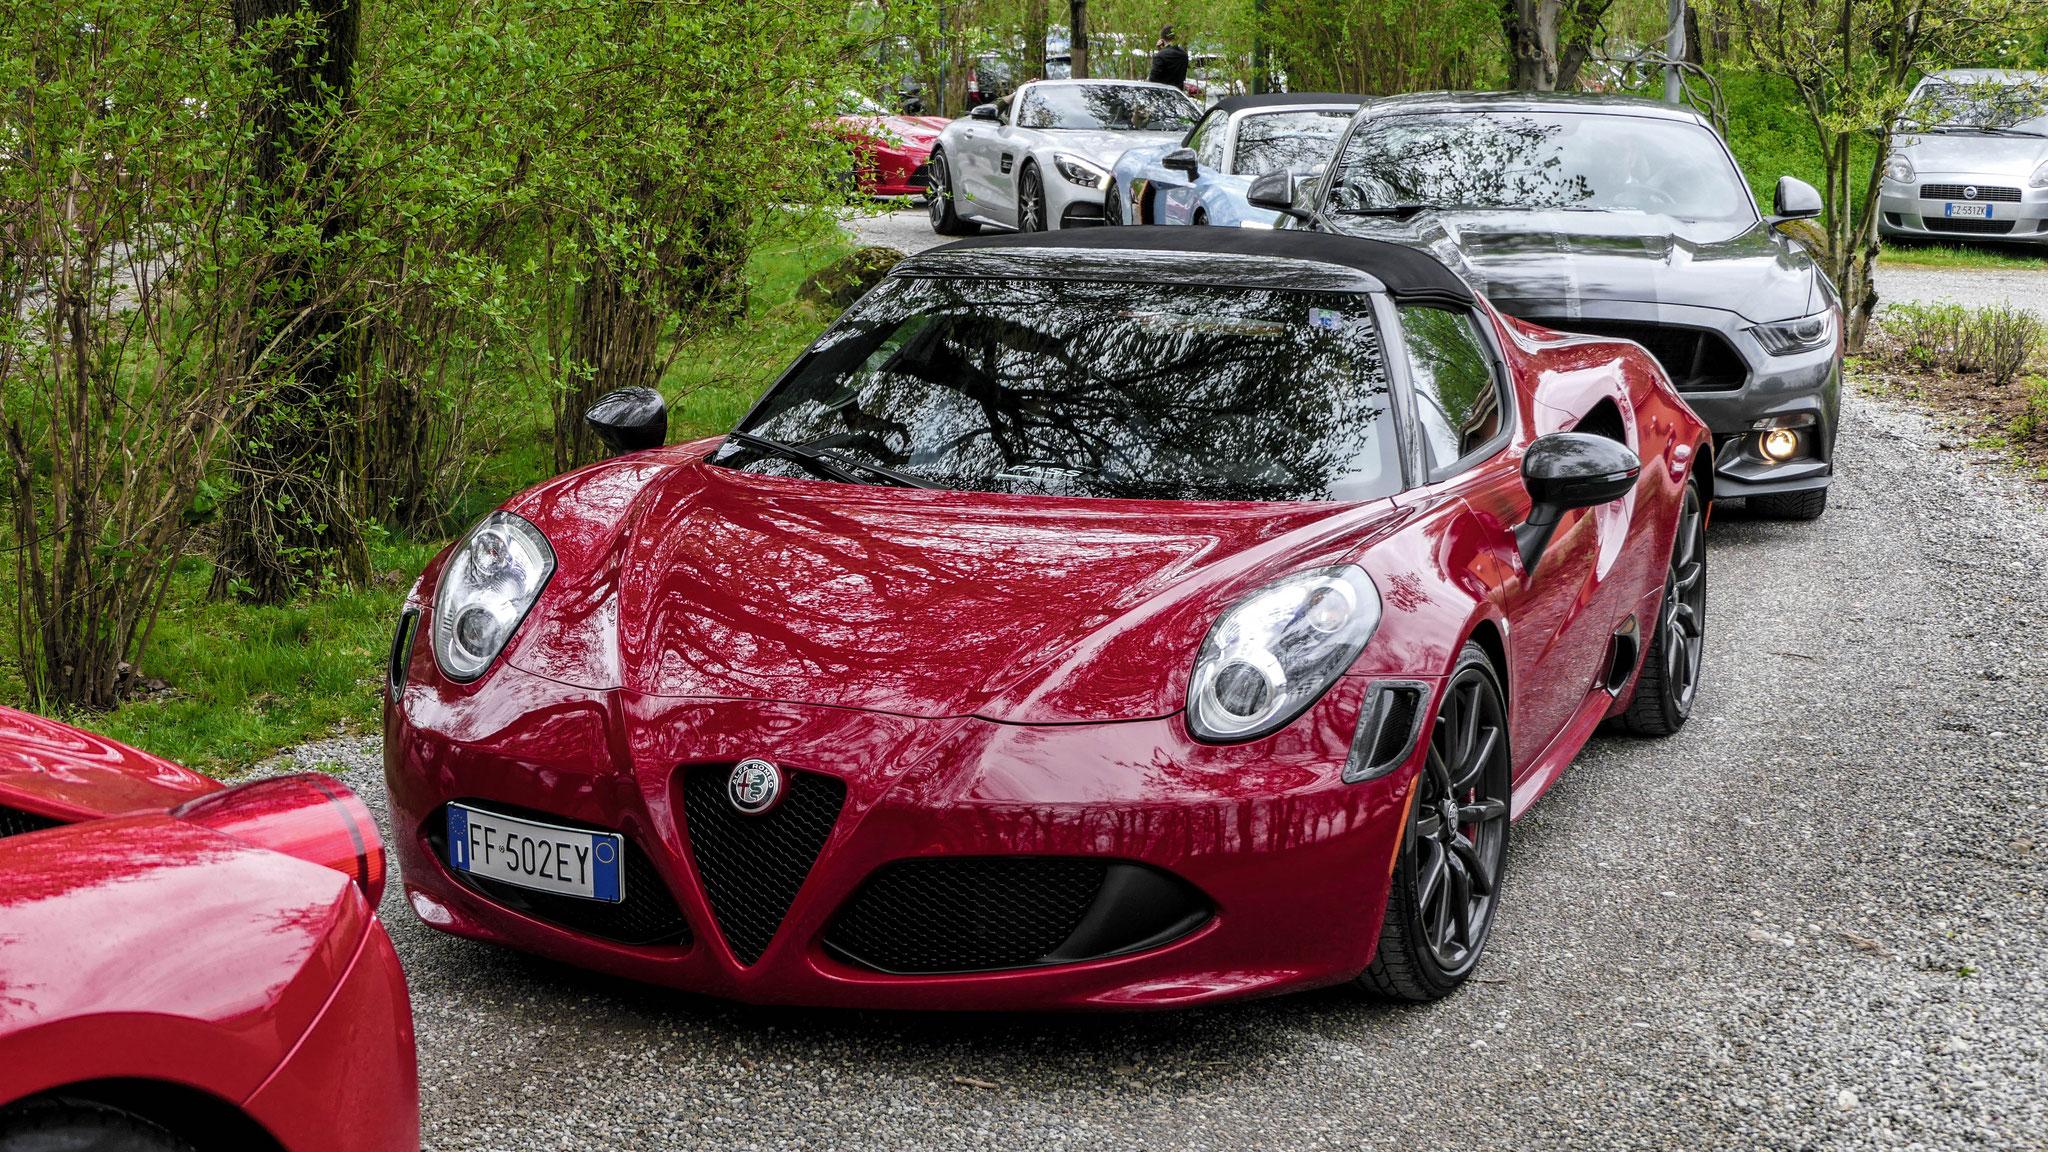 Alfa Romeo 4C Spyder - FF-502-EY (ITA)